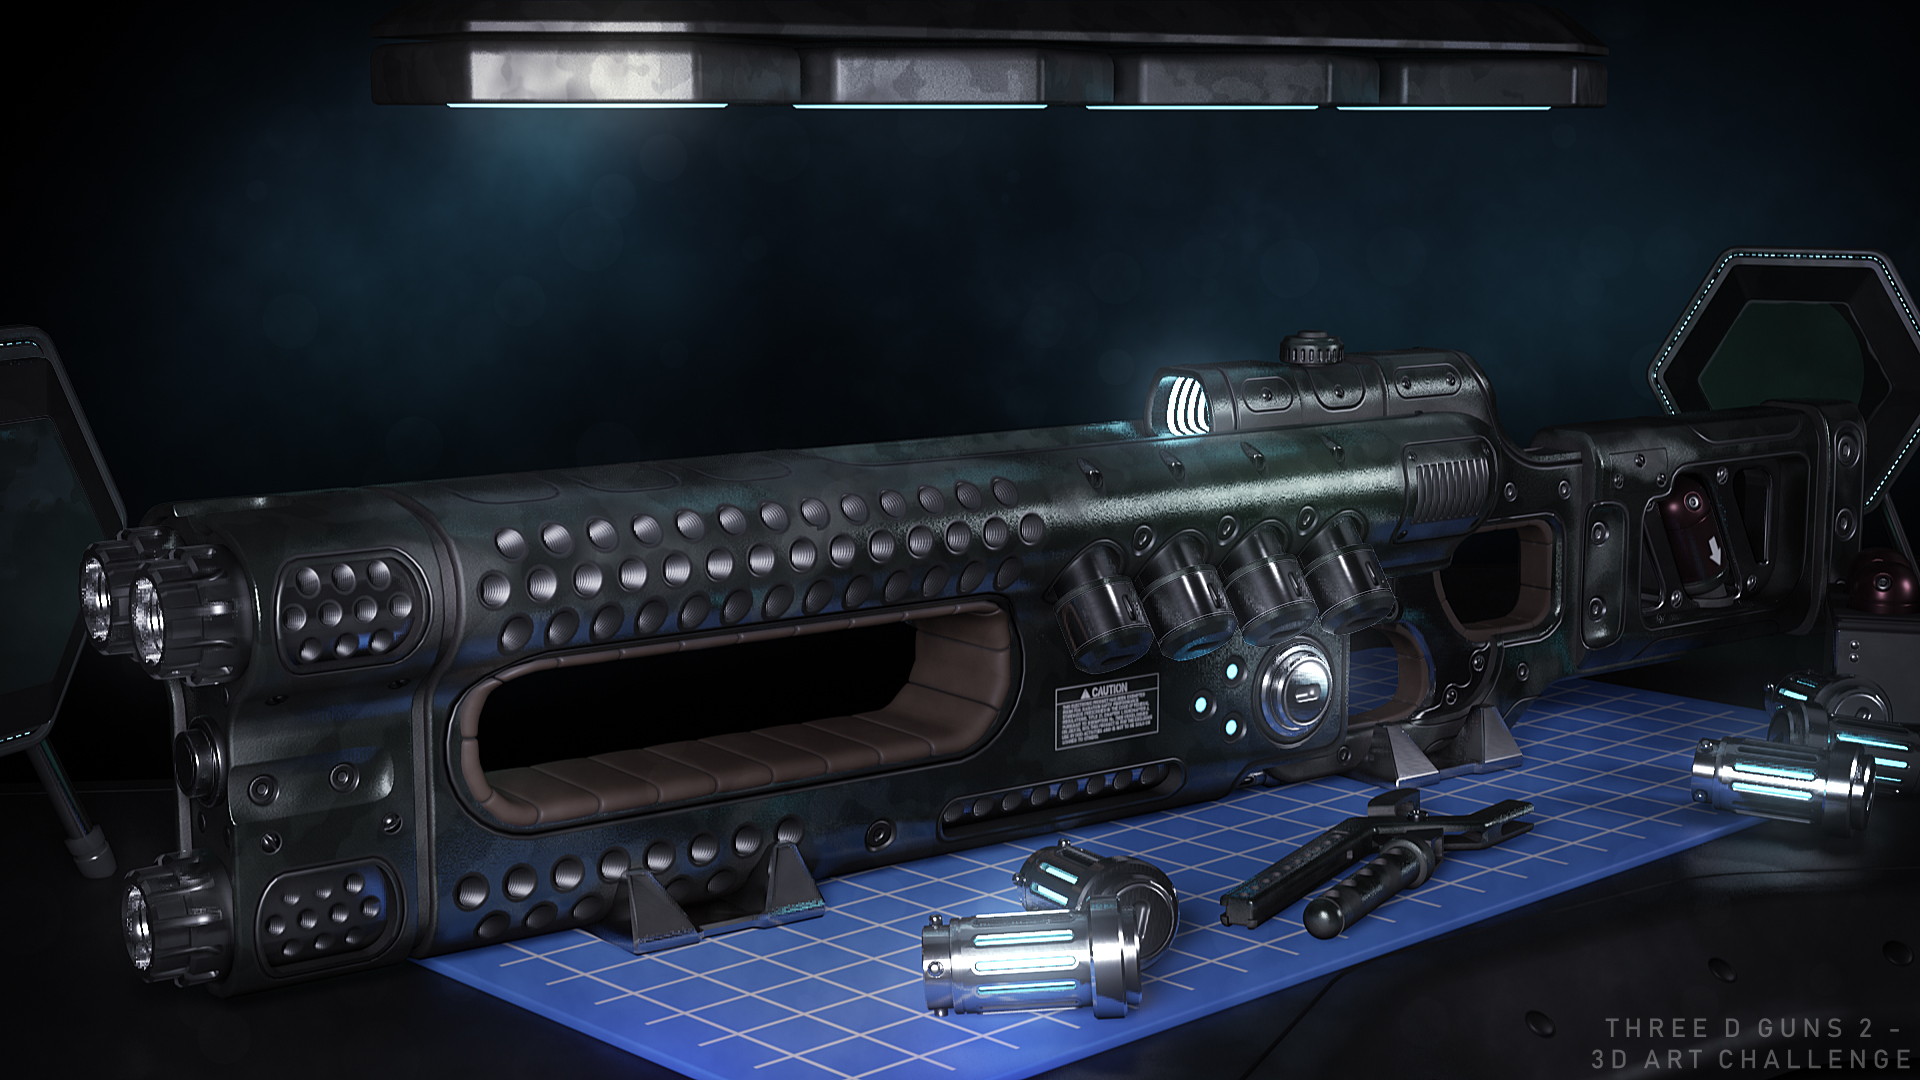 UltraTech SciFi Blaster 3d art